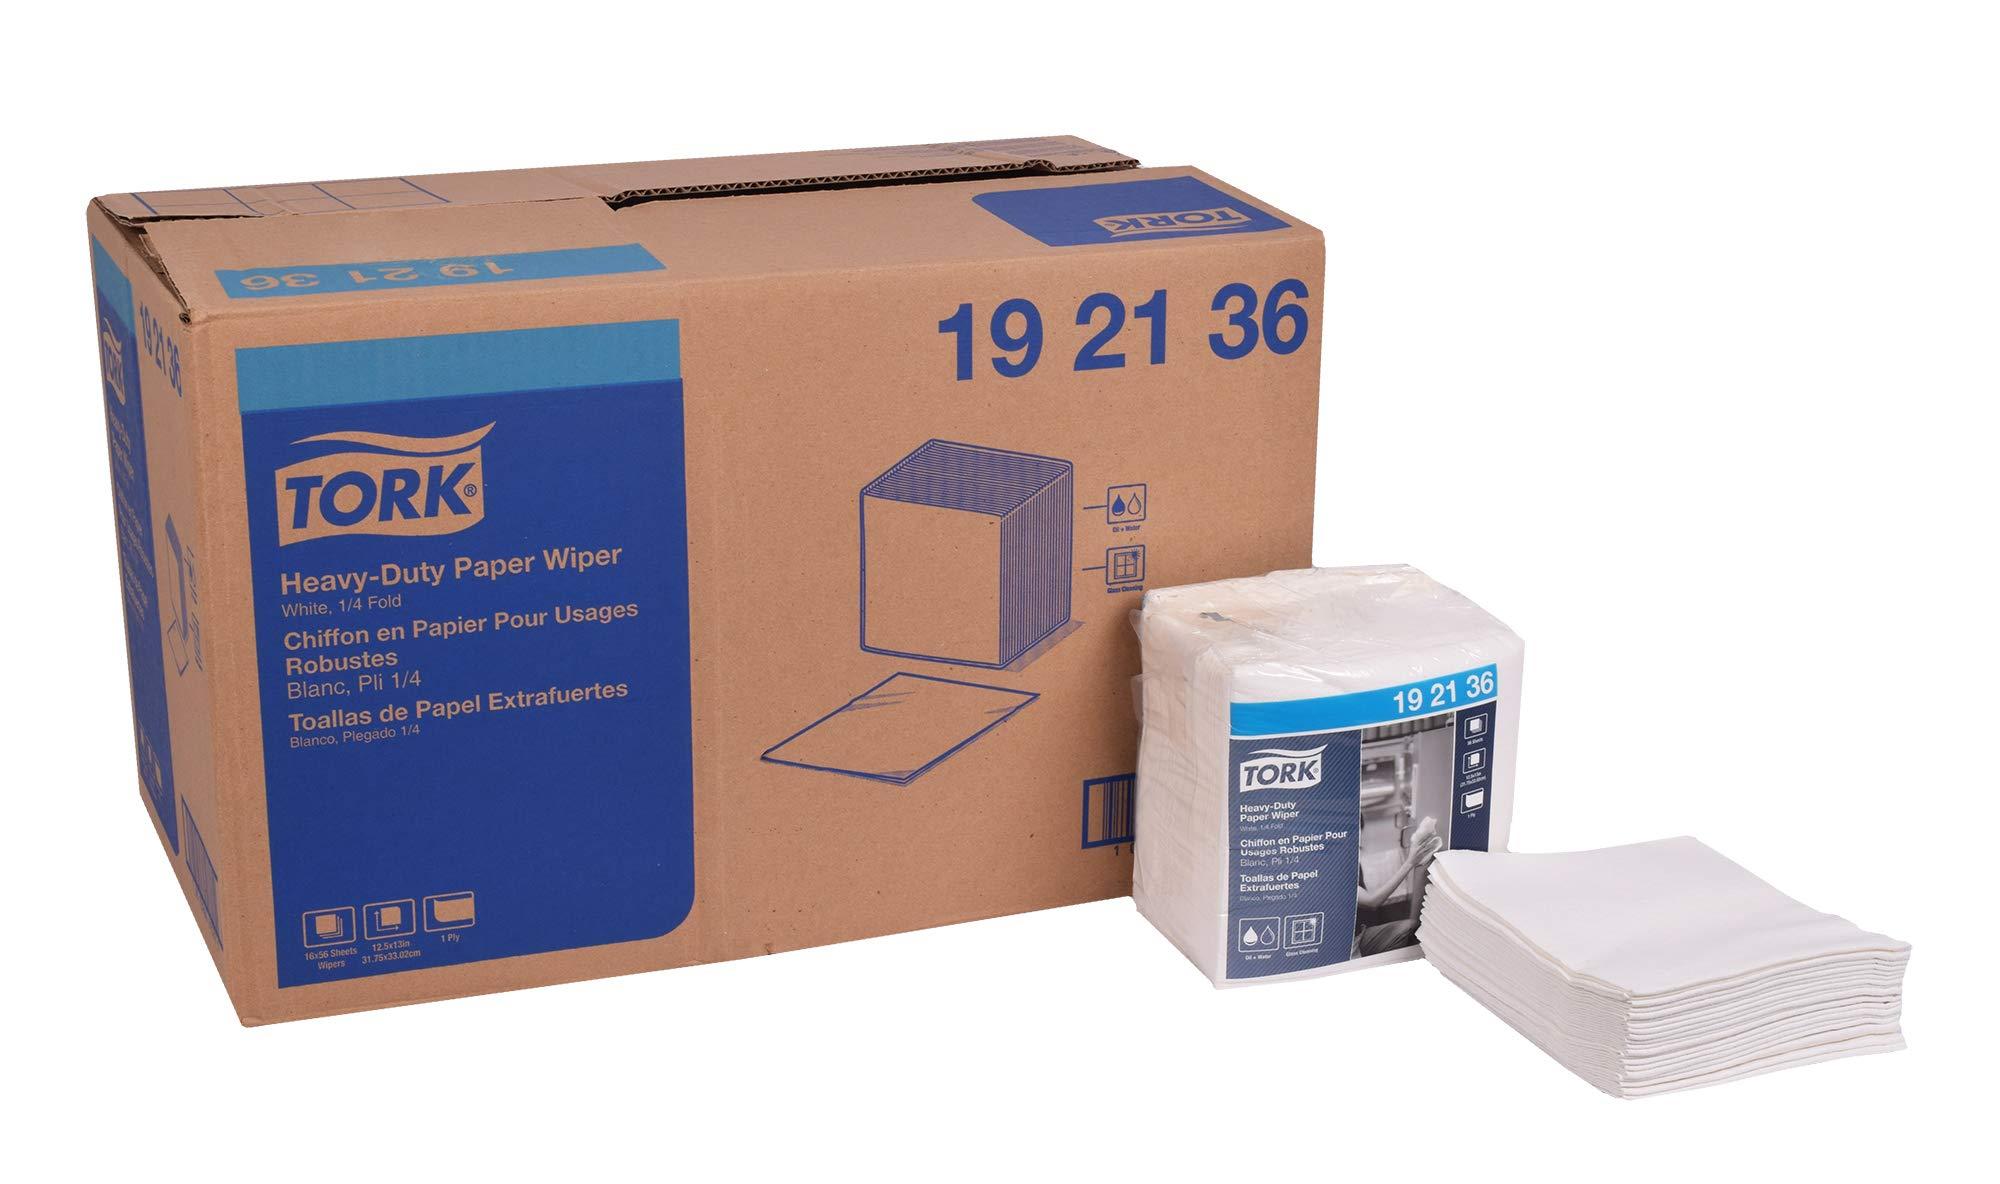 Tork 192136 Heavy-Duty Paper Wiper, 1/4 Fold, 1-Ply, 12.5'' Width x 13'' Length, White (Case of 16 Packs, 56 per Pack, 896 Towels) by Tork